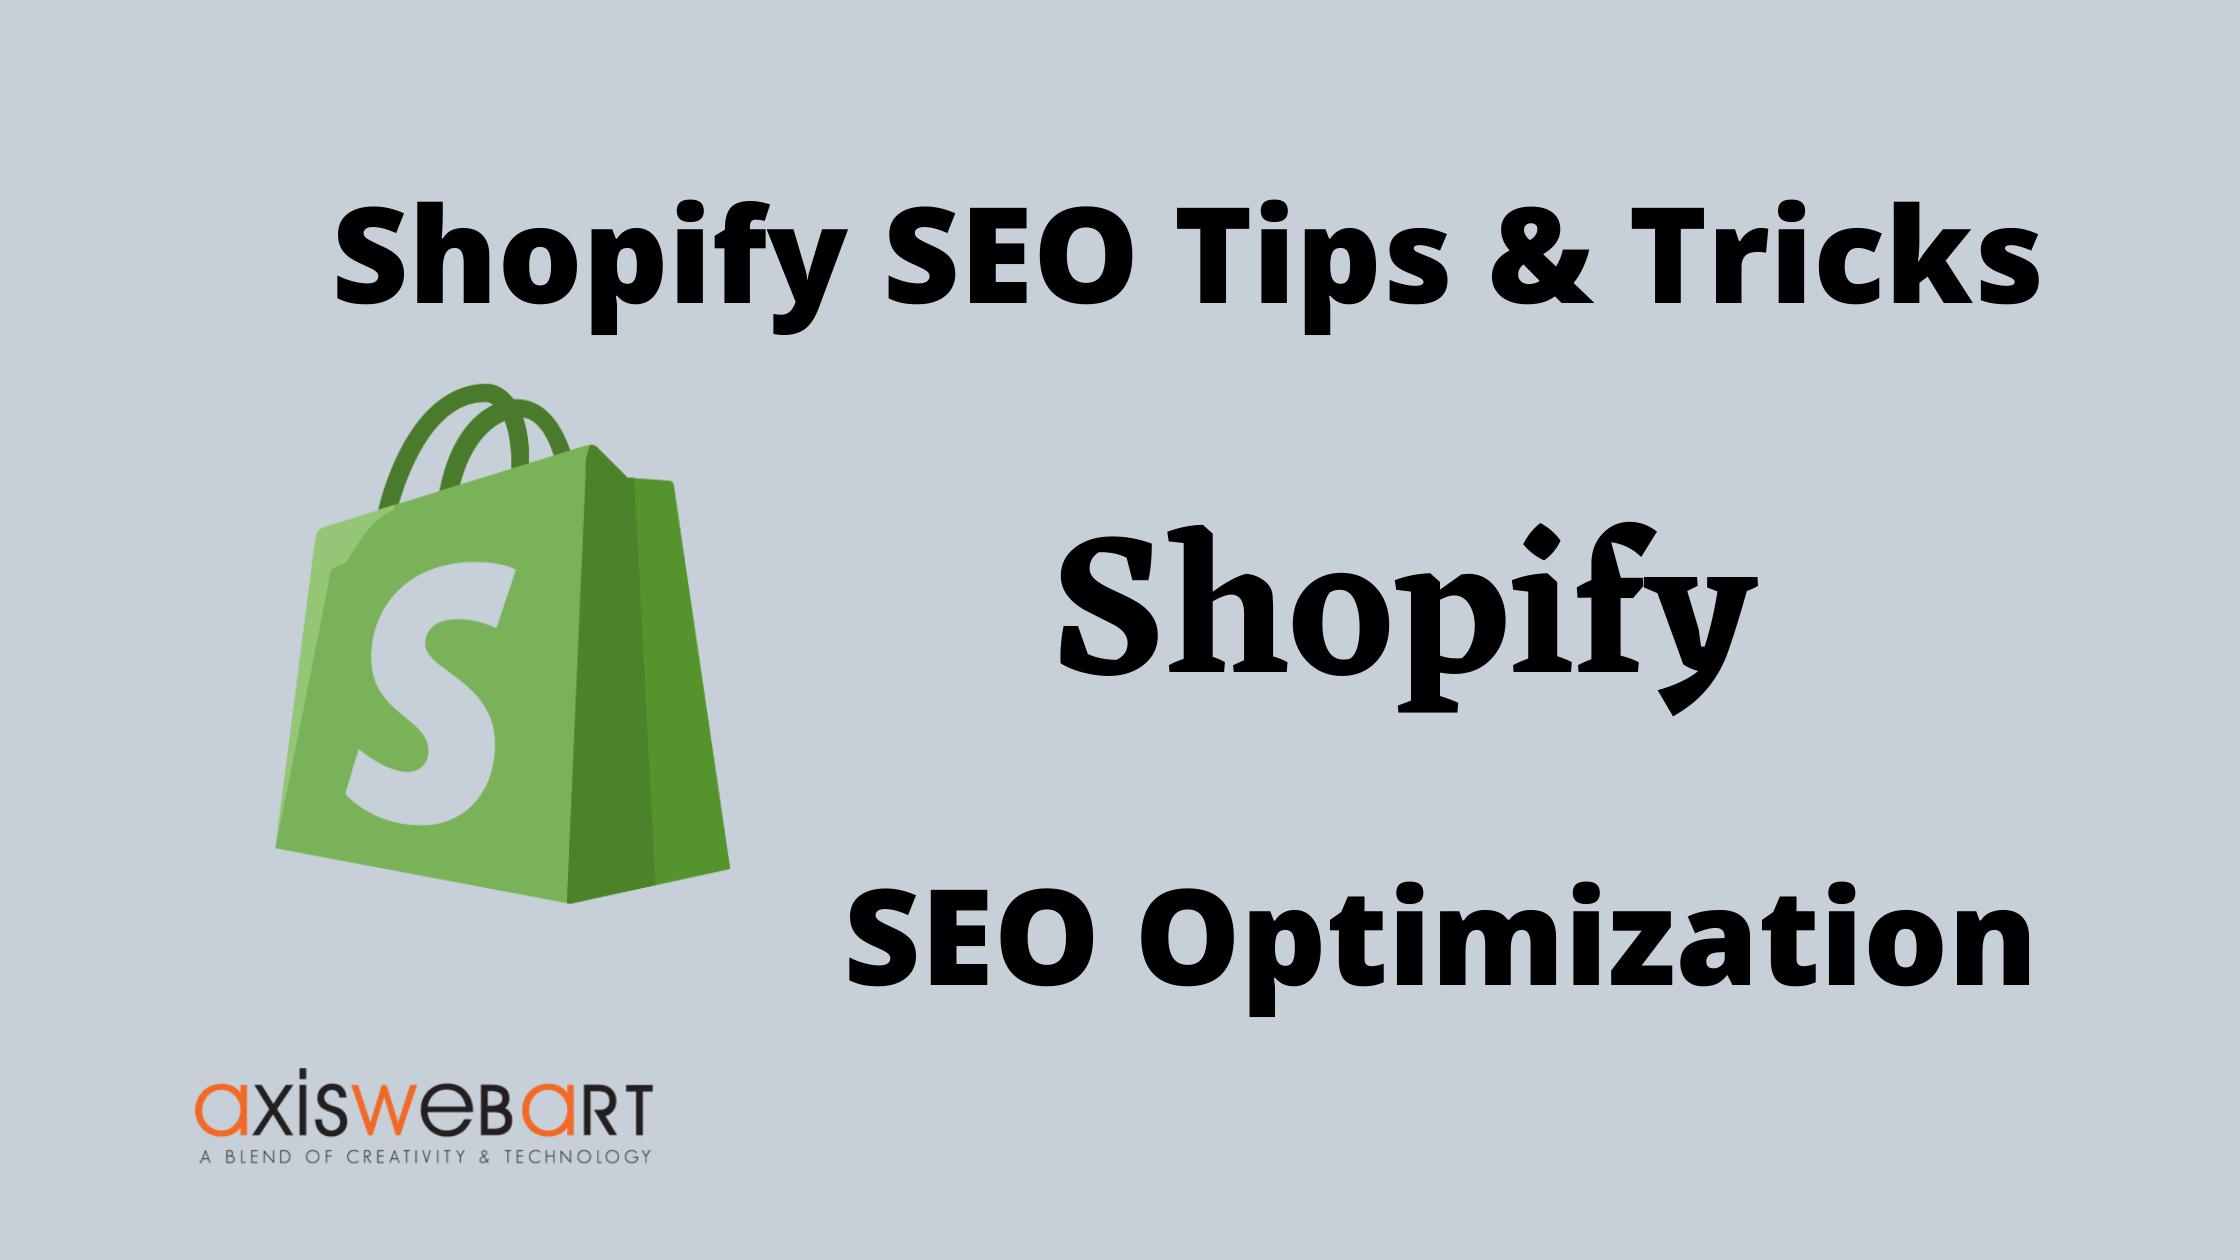 shopify seo tips & tricks